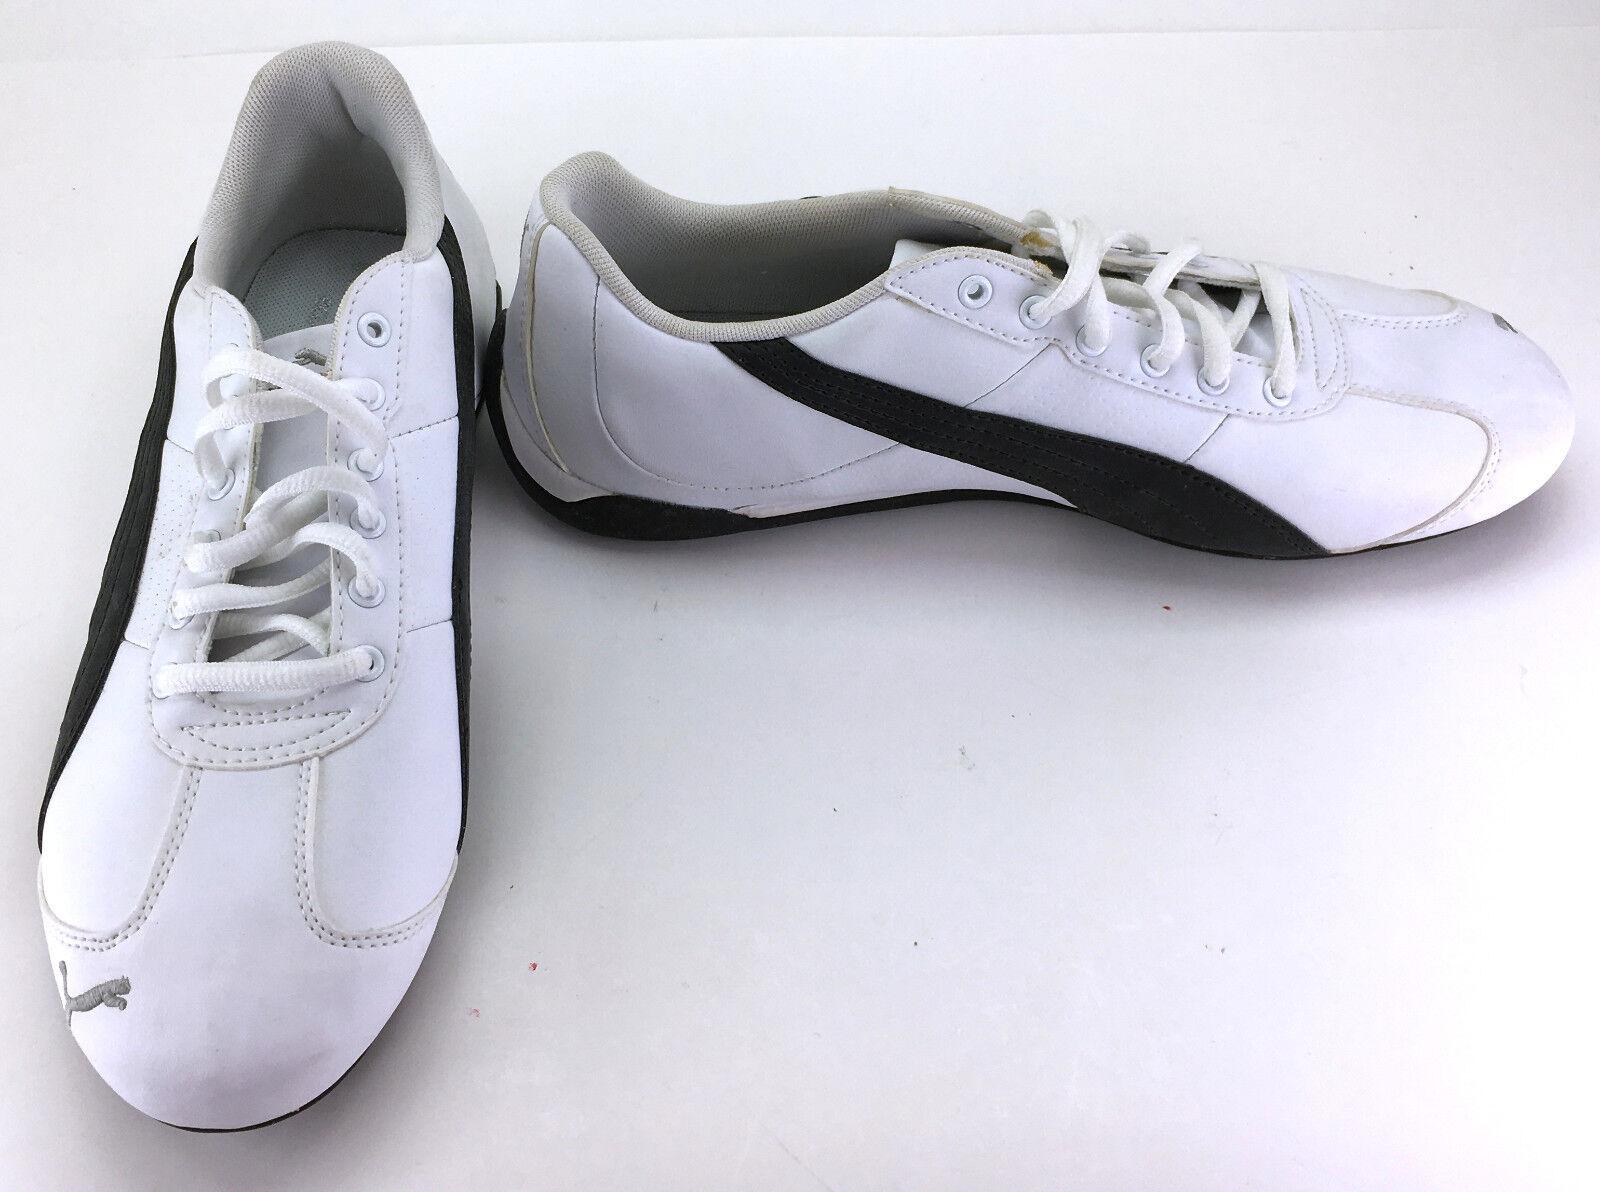 Puma Shoes Repli Cat III 3 LT White/Black Sneakers Comfortable